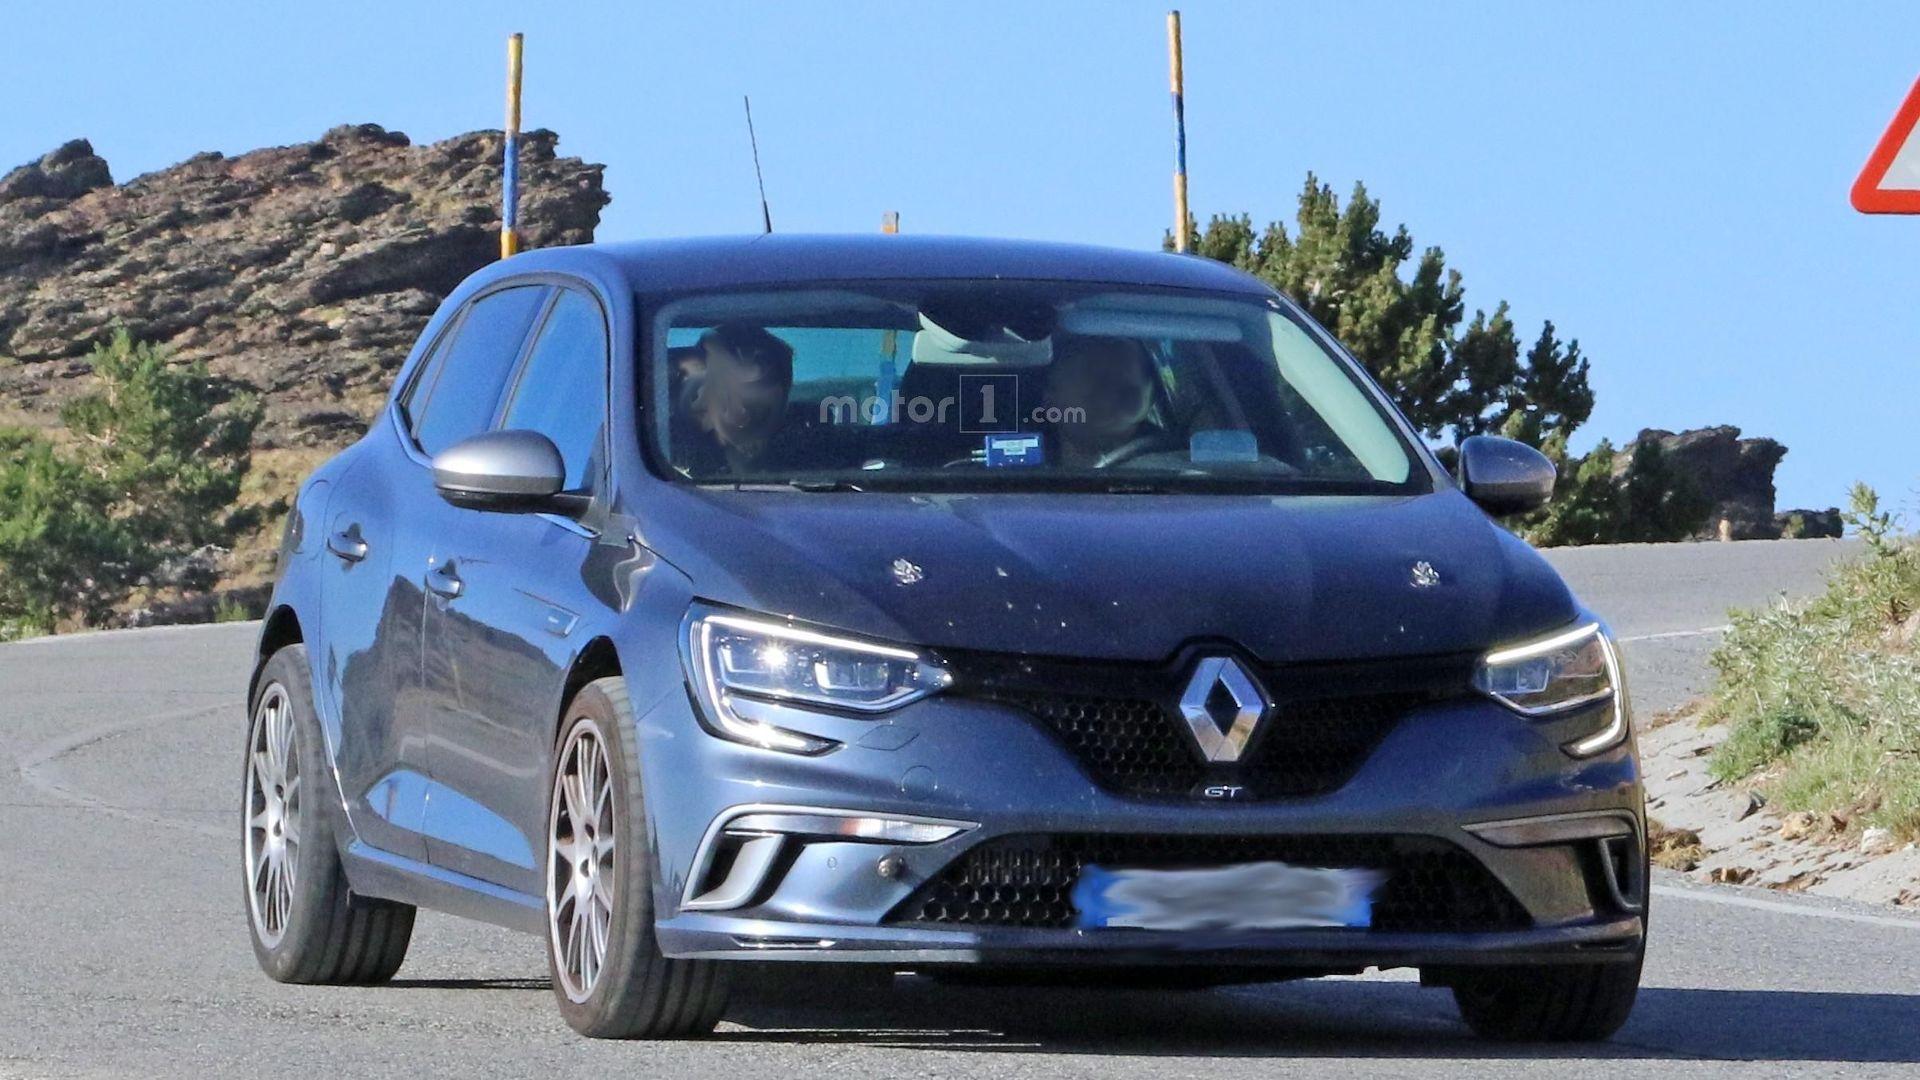 2018 Renault Megane Rs Hides Underneath Gt Skin